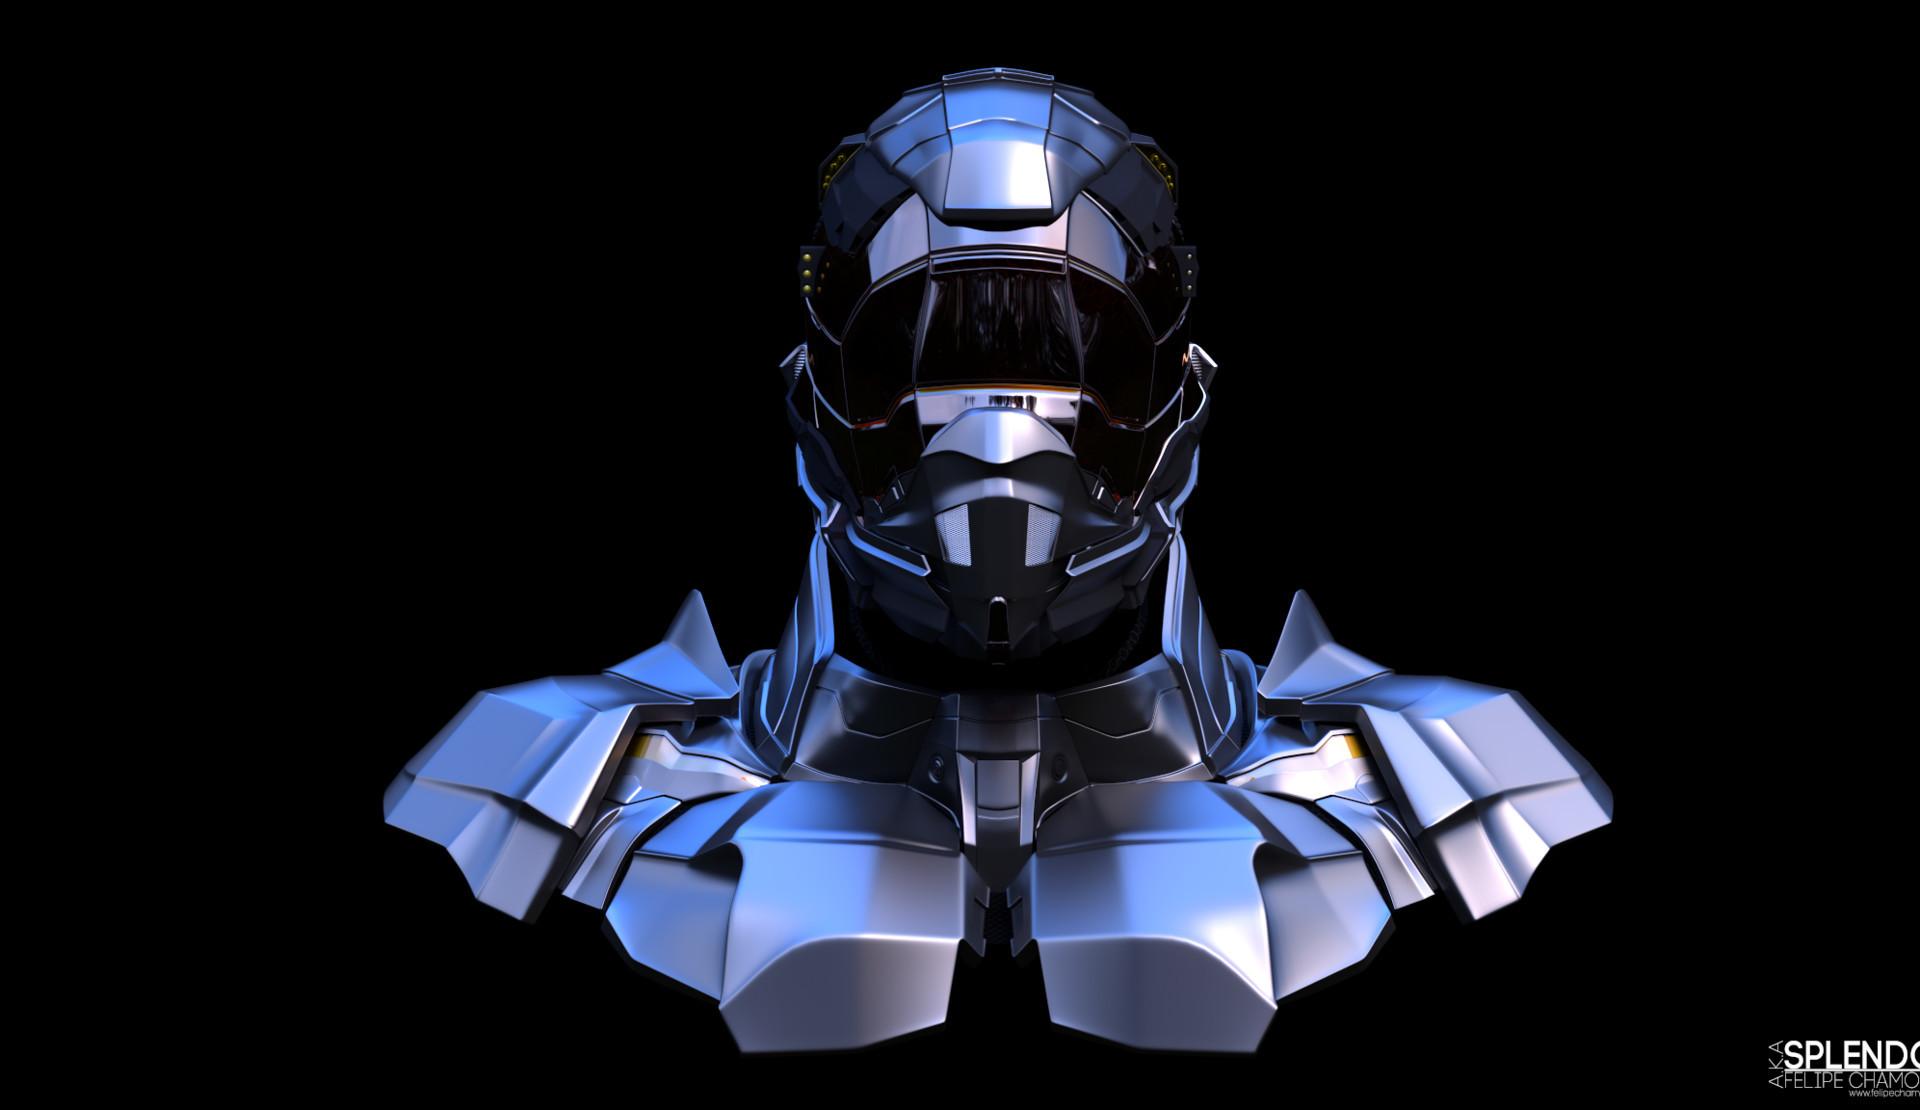 Splendor Helmet SX5 - Armoured Bust